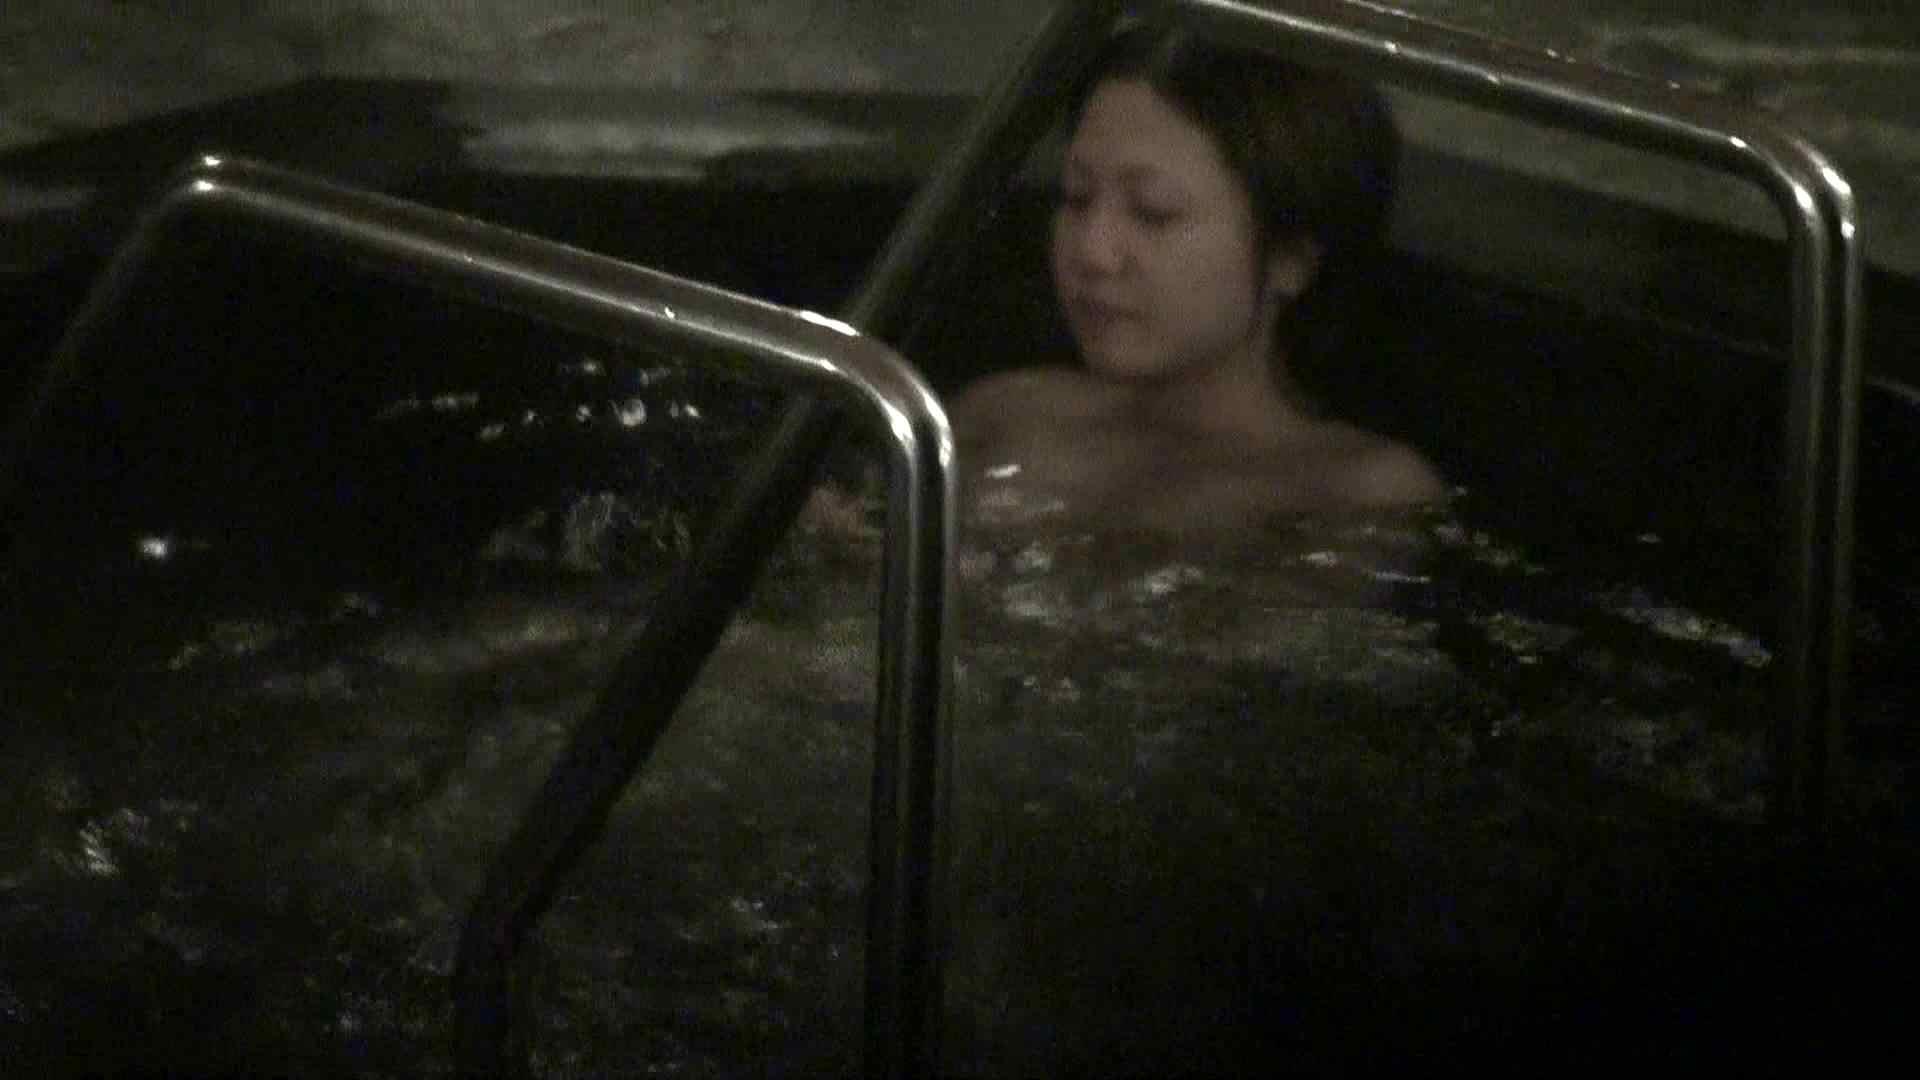 Aquaな露天風呂Vol.411 盗撮 | HなOL  49pic 37